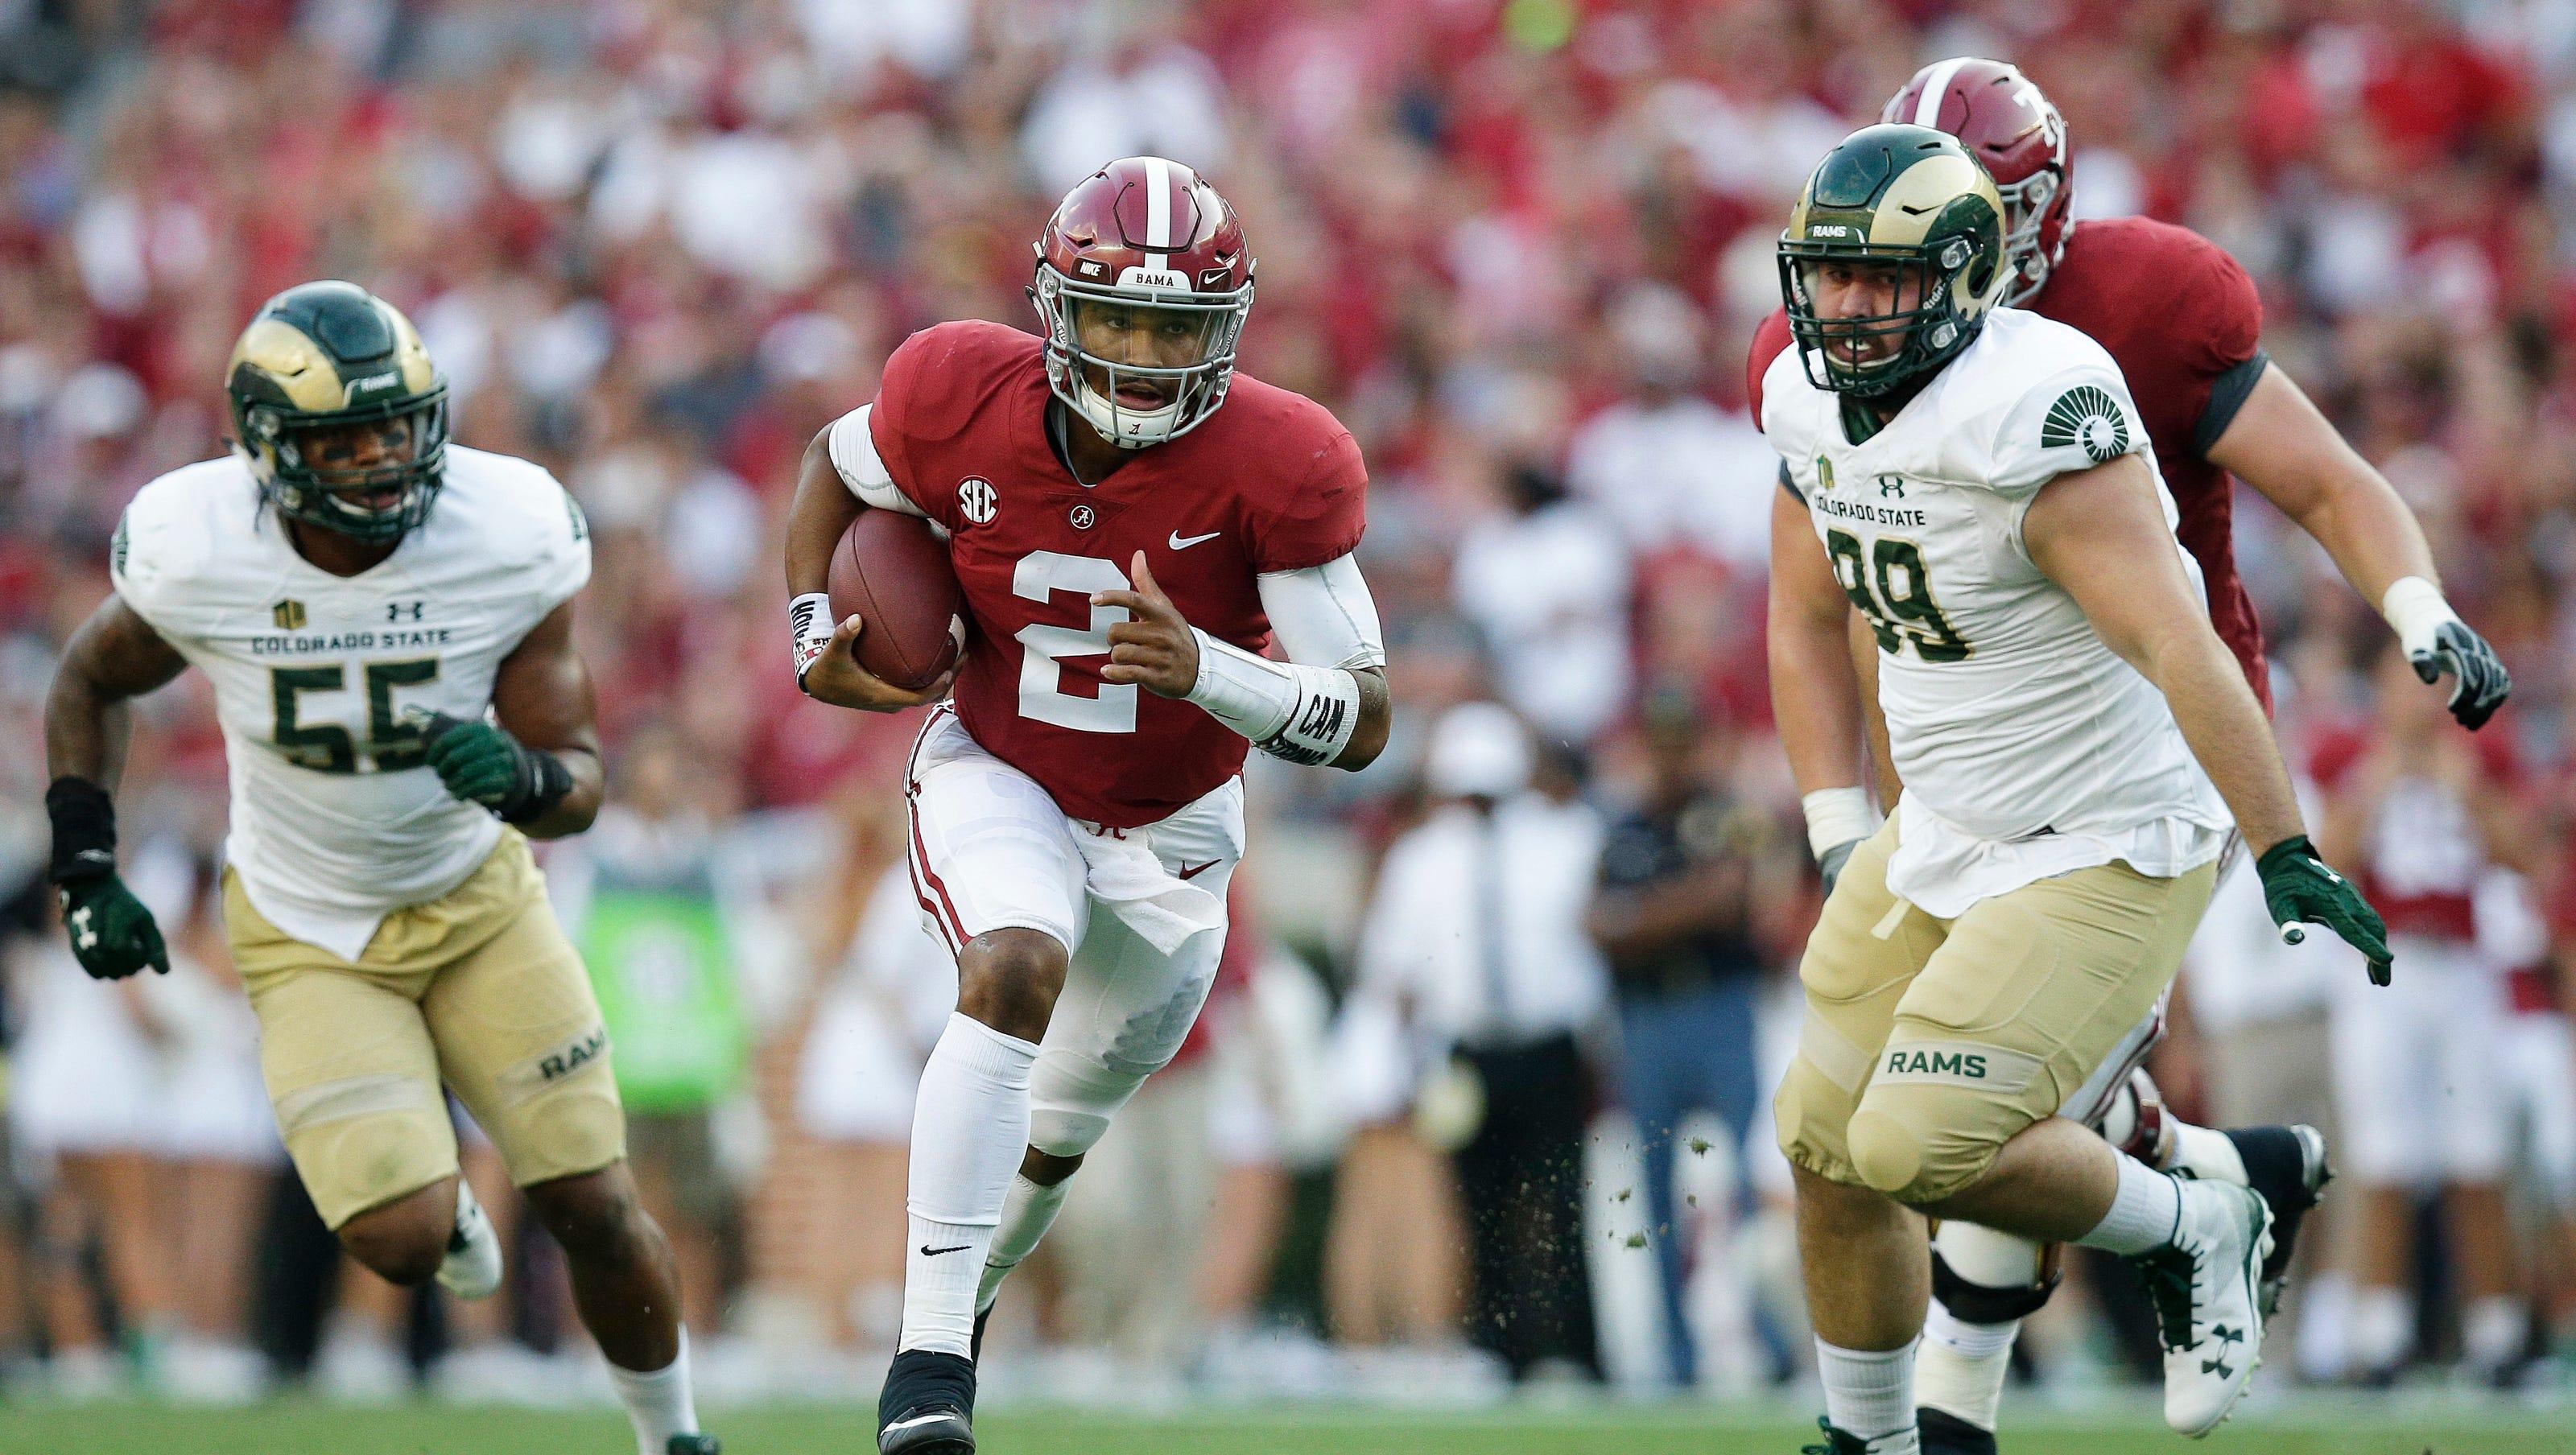 Csu Football Earns A C Minus In Loss At Alabama